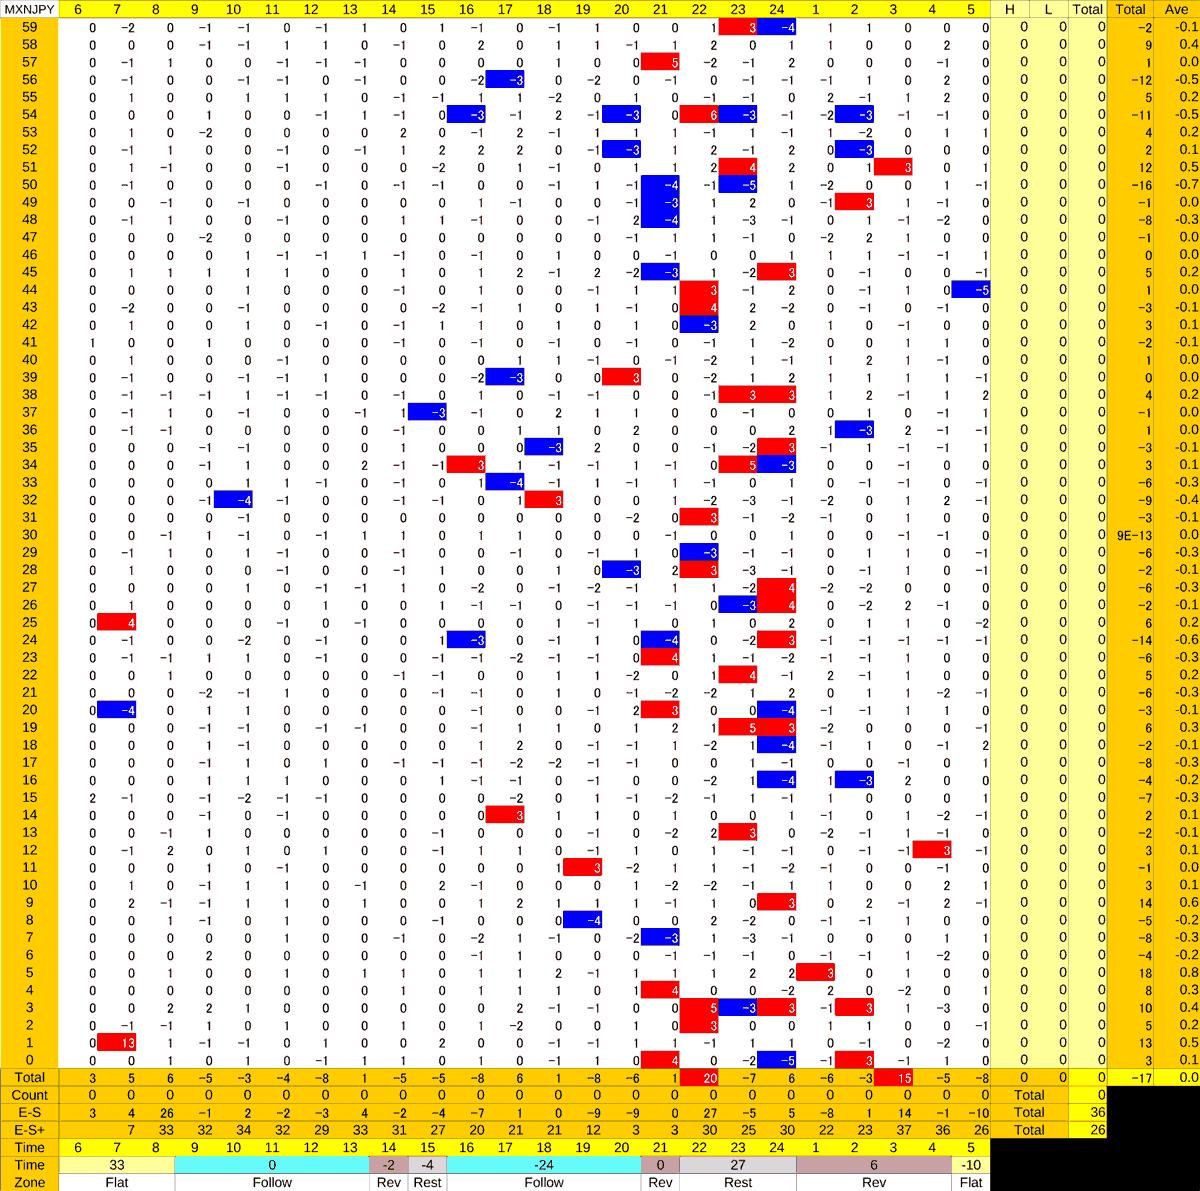 20201026_HS(3)MXNJPY